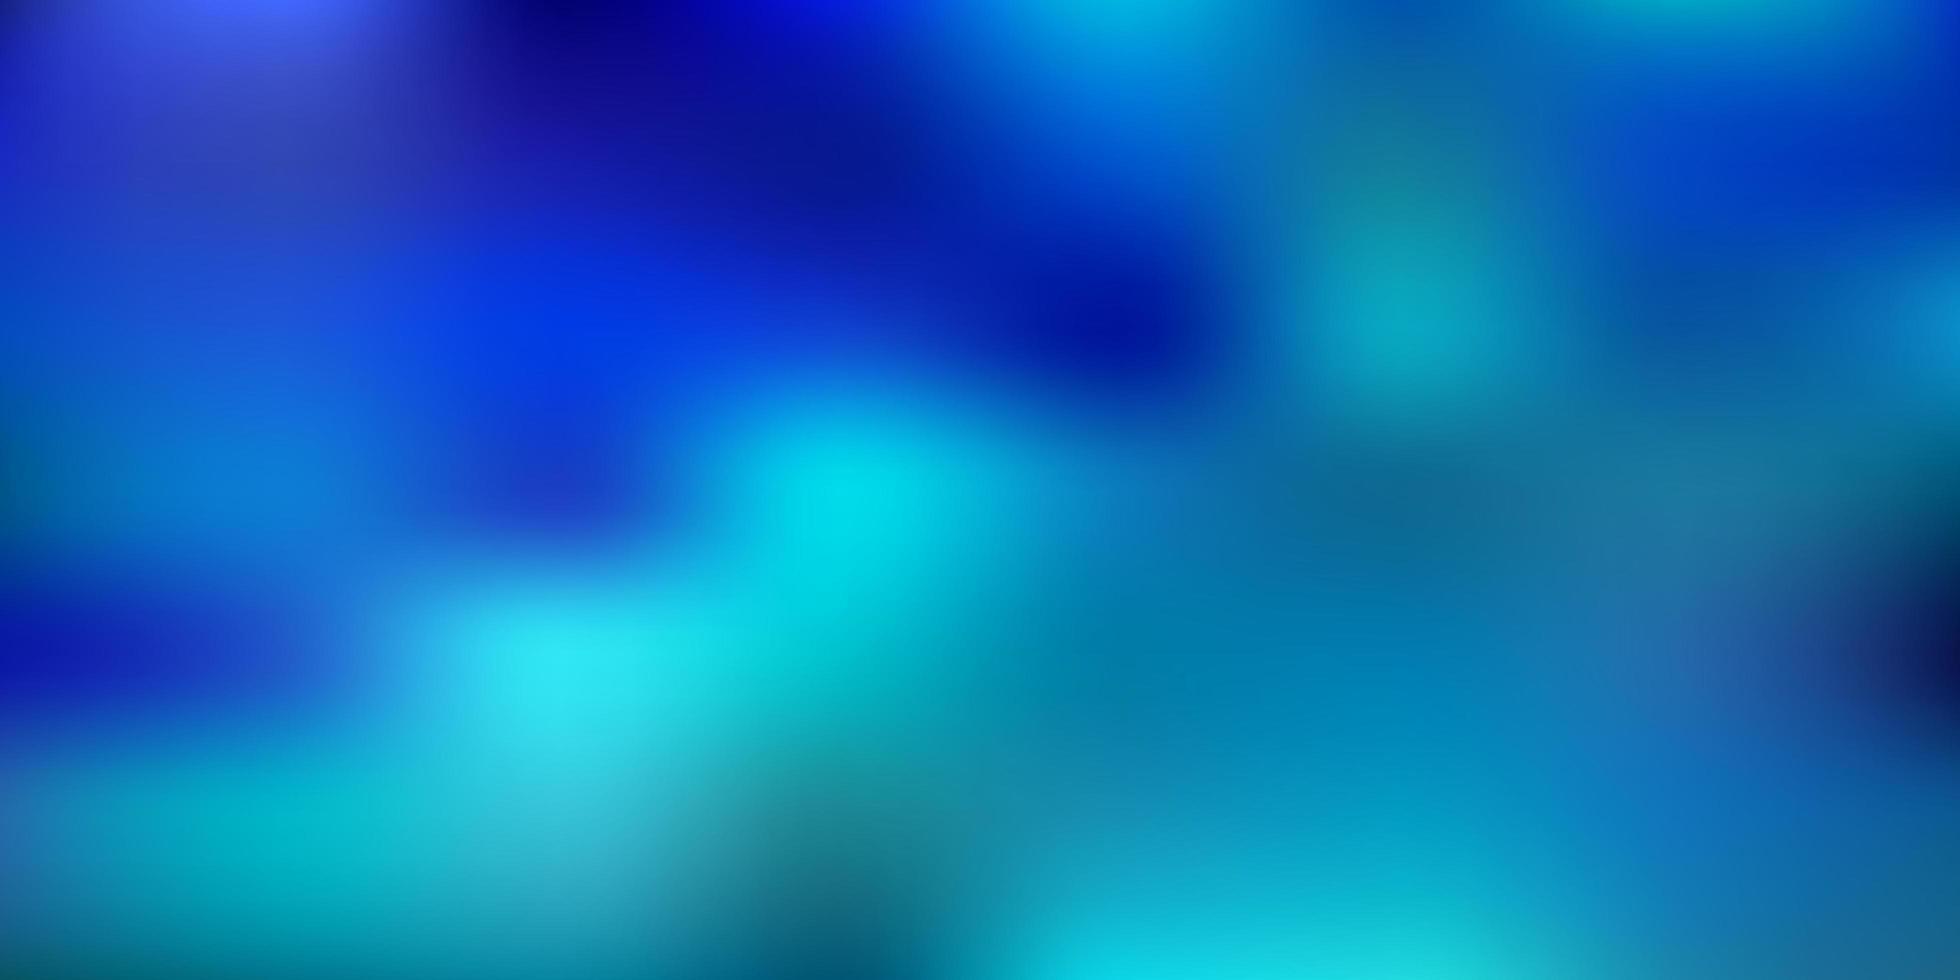 plantilla de desenfoque de vector azul claro.